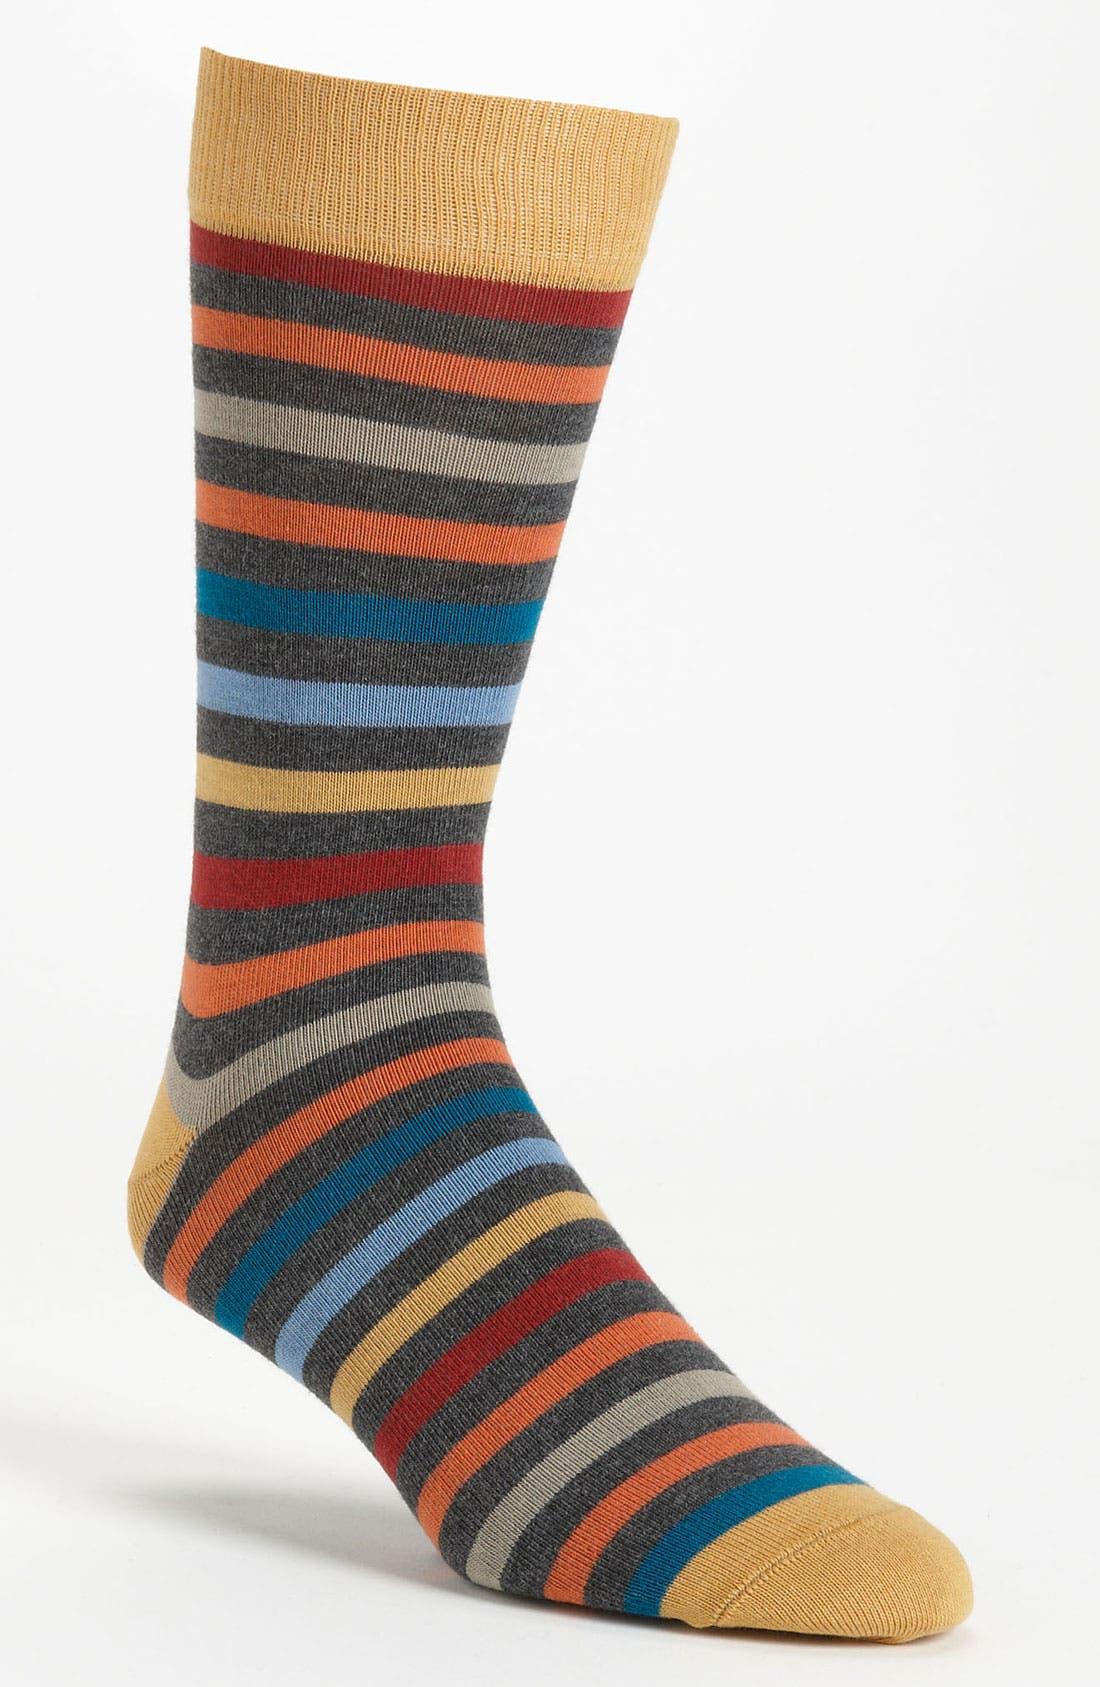 Alternate Image 1 Selected - Pact 'All Over' Stripe Socks